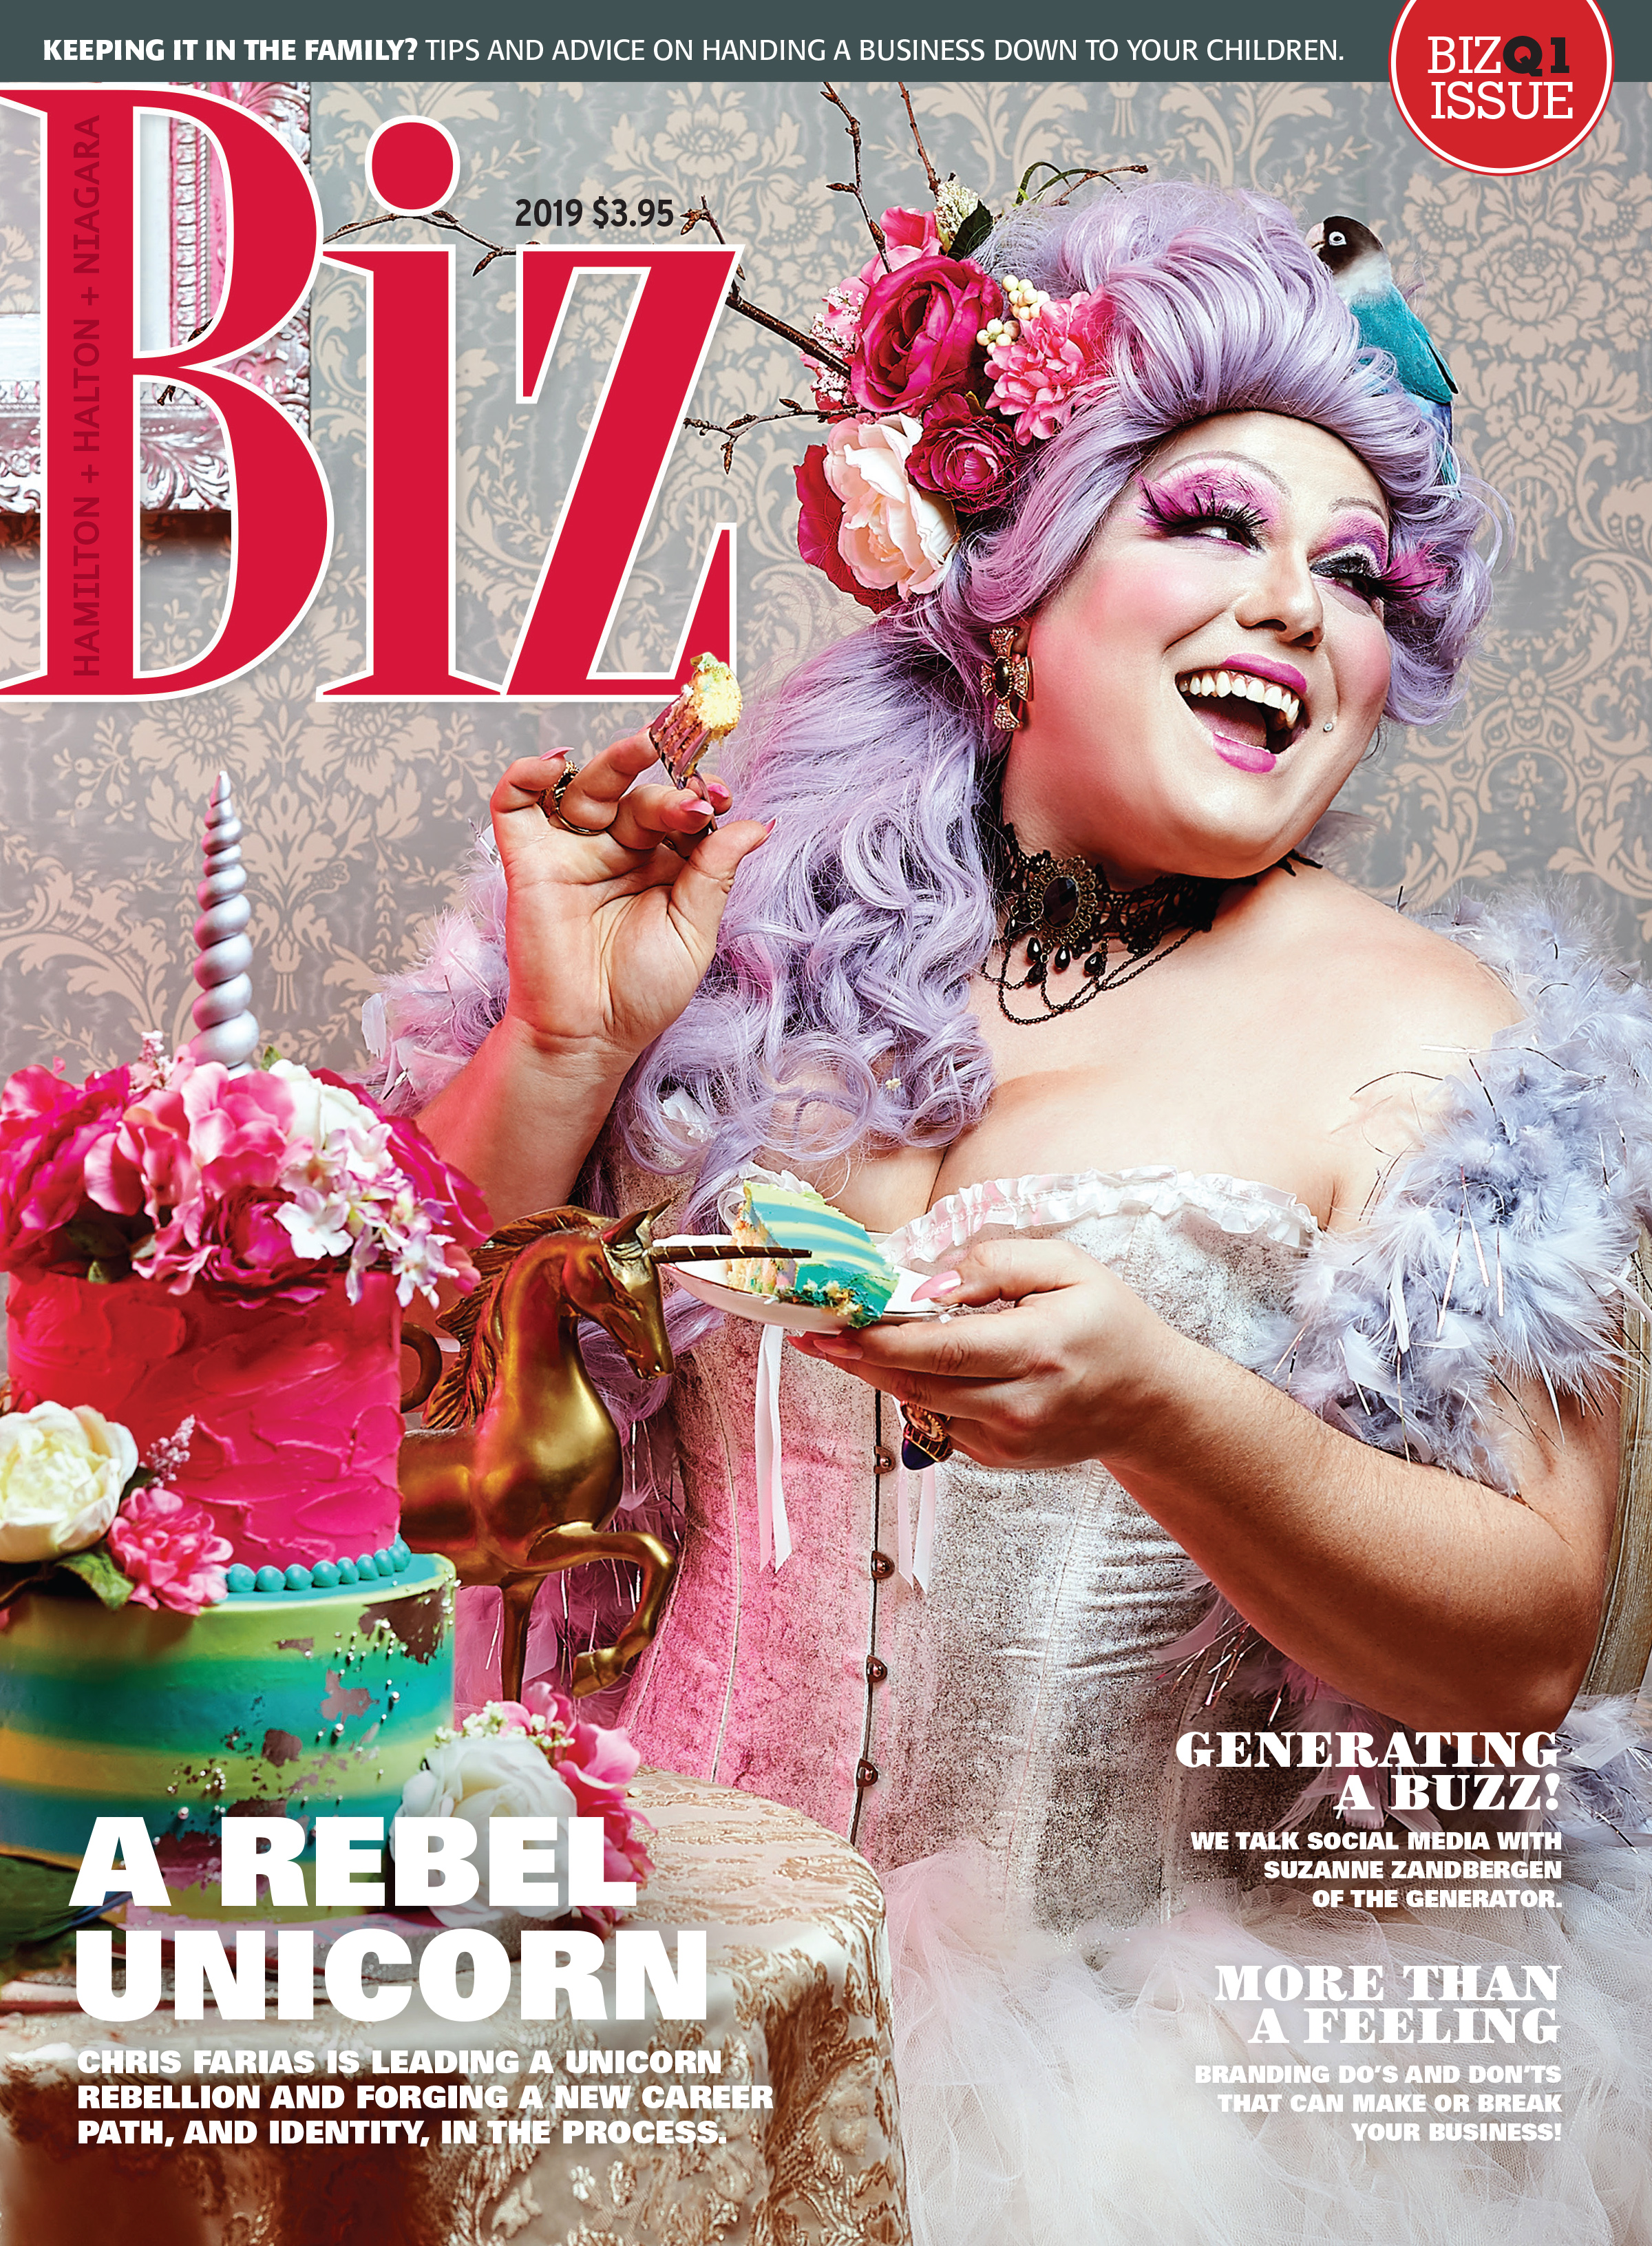 marta-hewson-biz-magazine-cover-chris-farias-rebel-unicorn.jpg